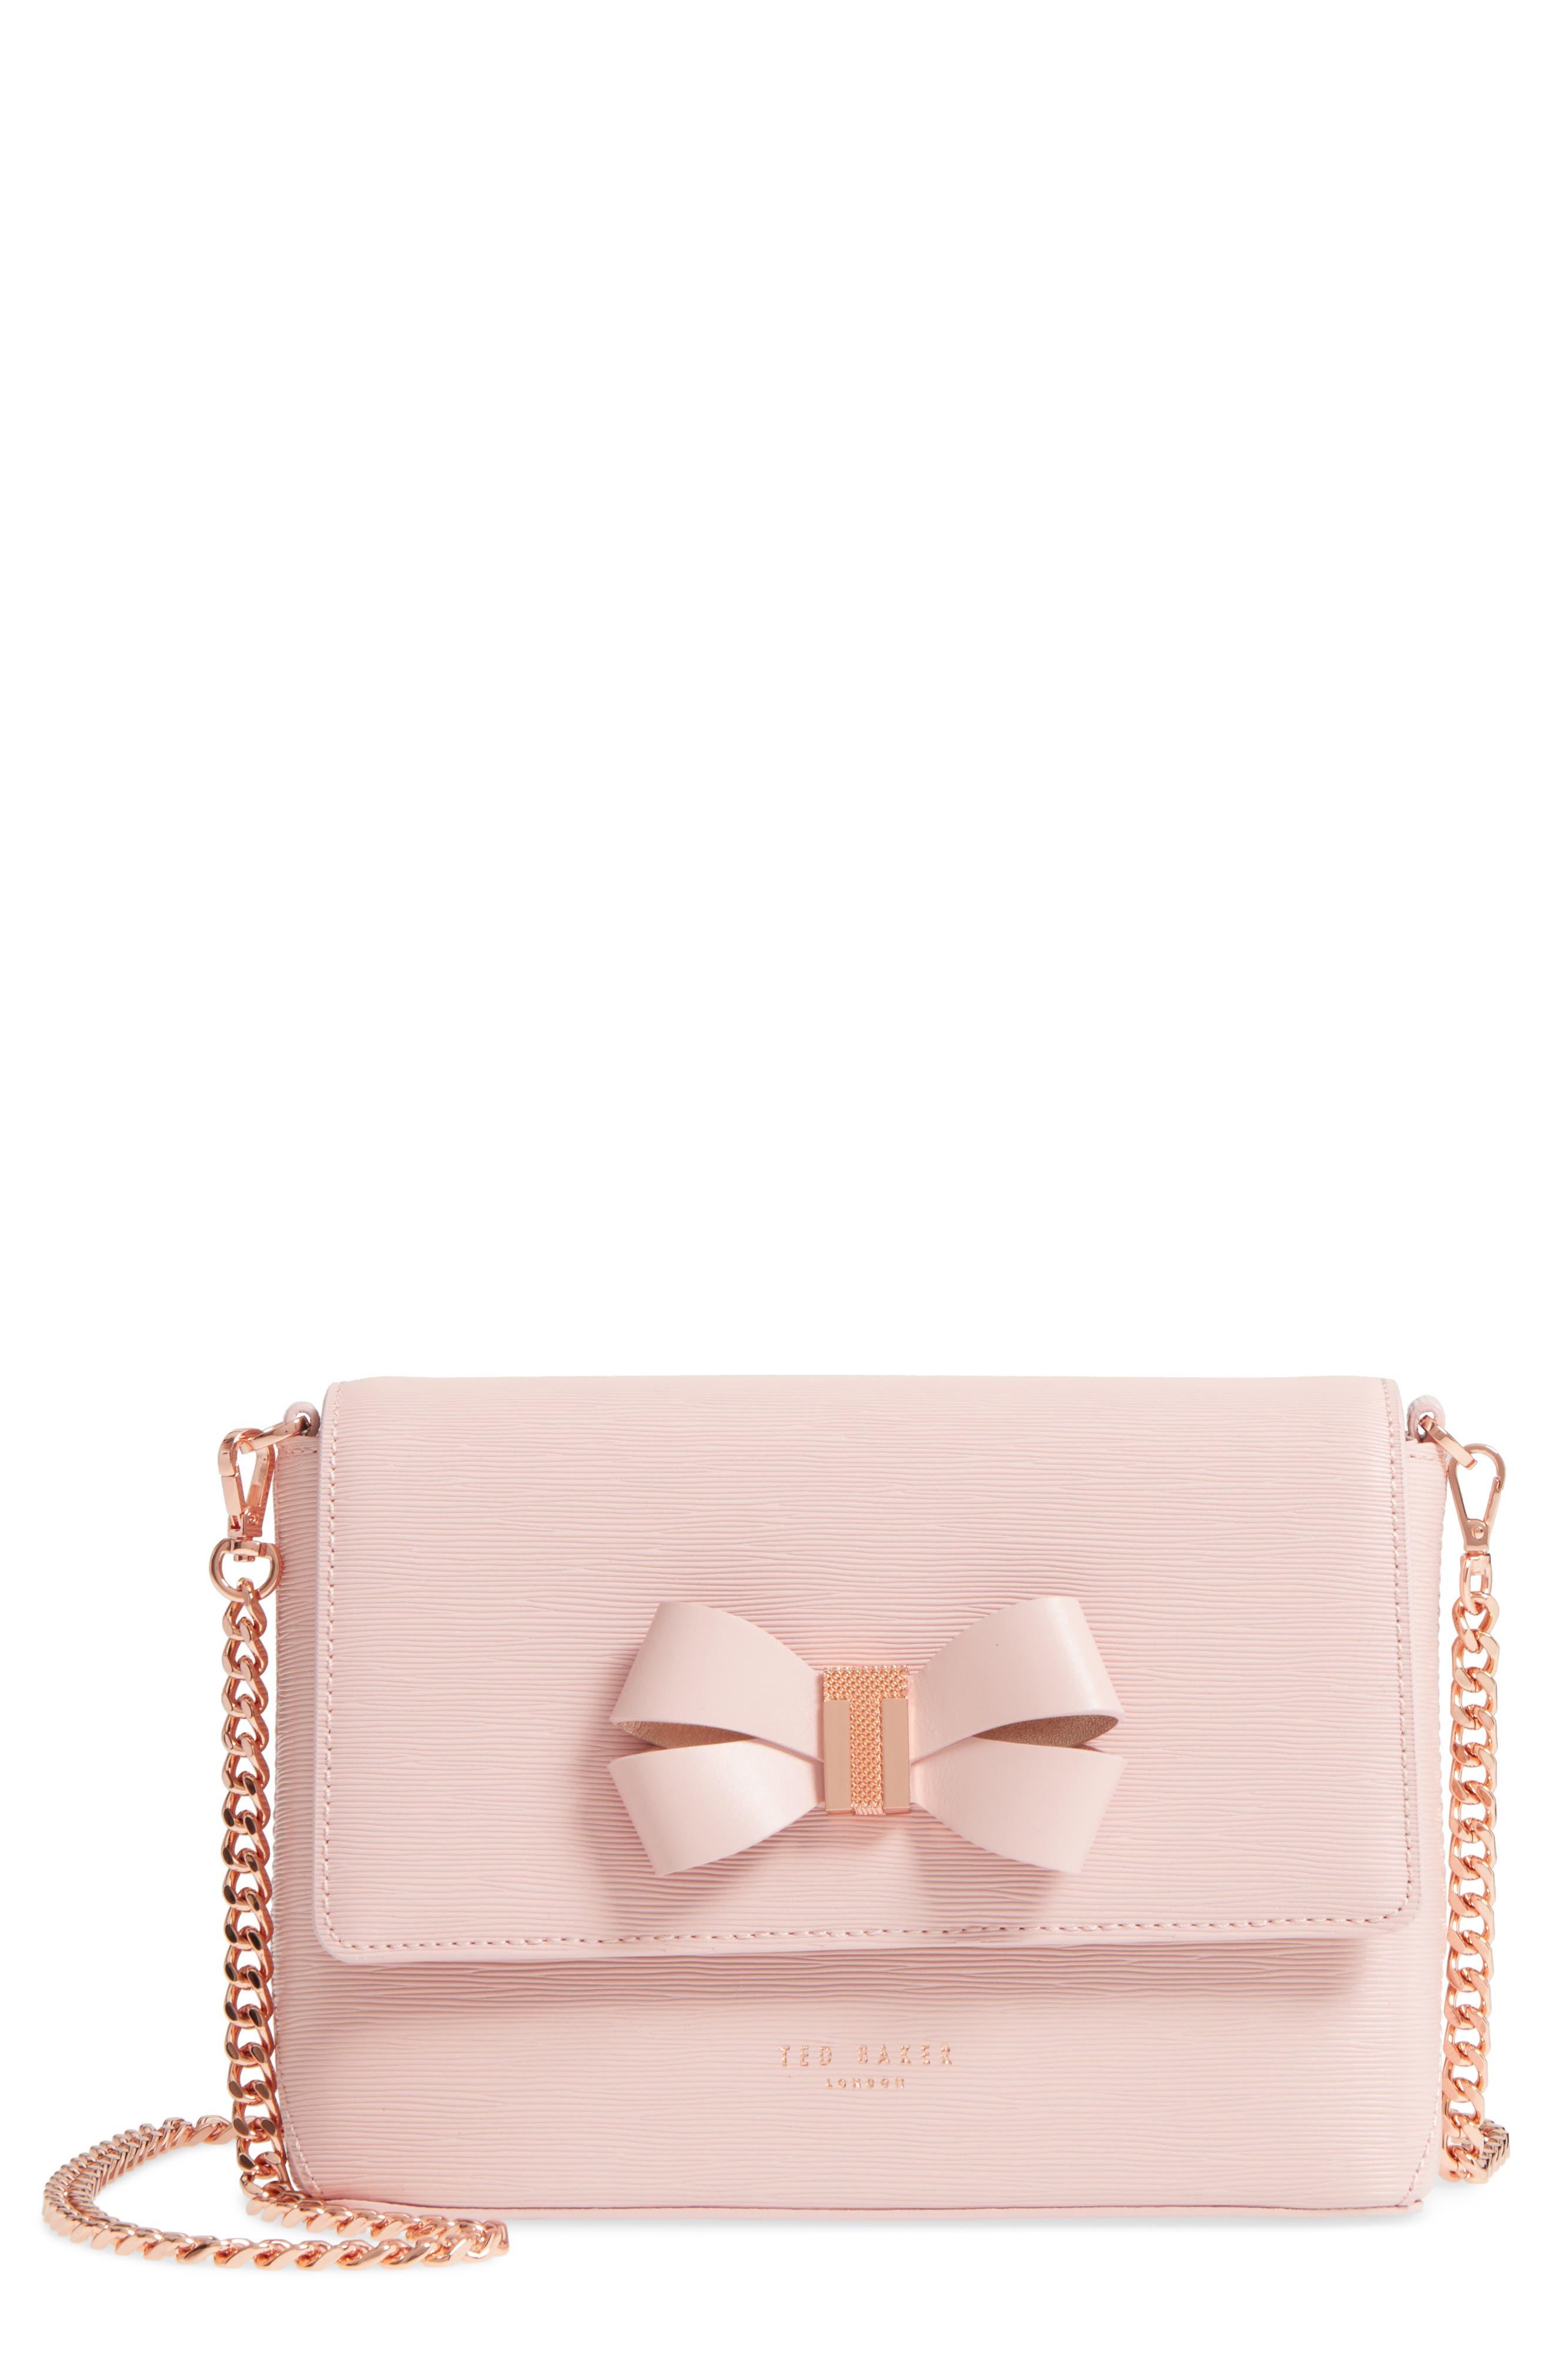 Bowii Bow Mini Bark Leather Crossbody Bag,                             Main thumbnail 1, color,                             Light Pink